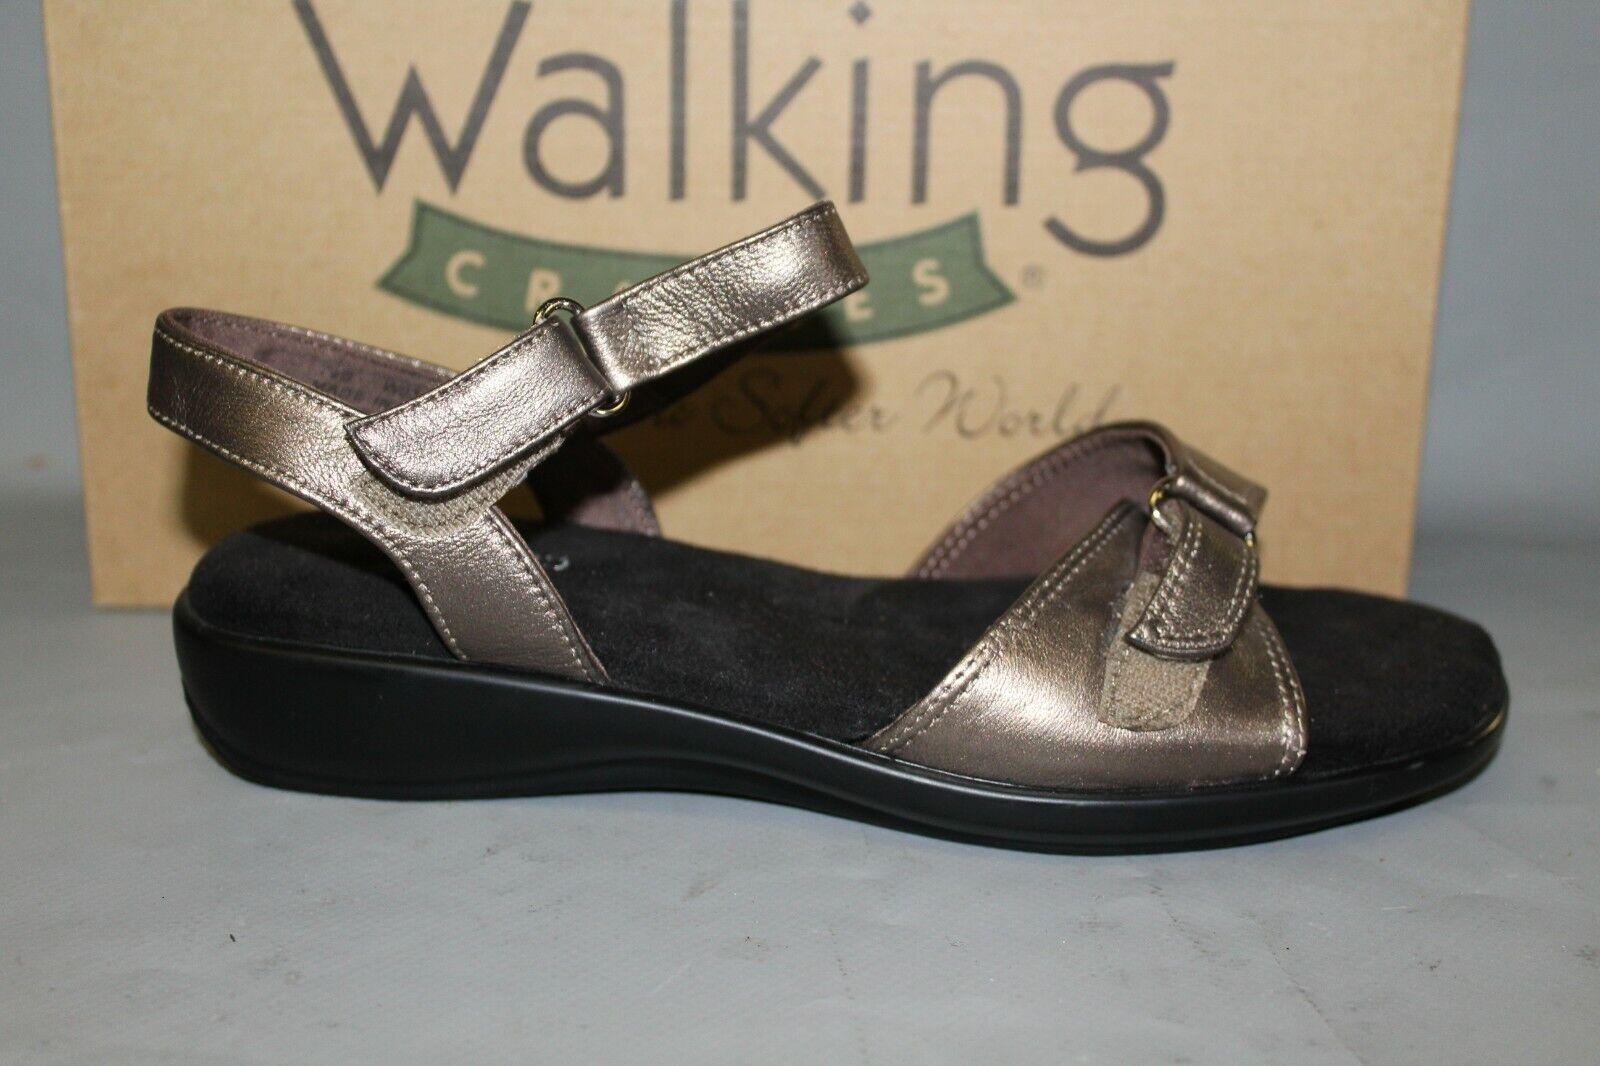 NEW Women's Walking Cradle Sky 2 Size 8.5 B Bronze Leather Comfortable Sandals